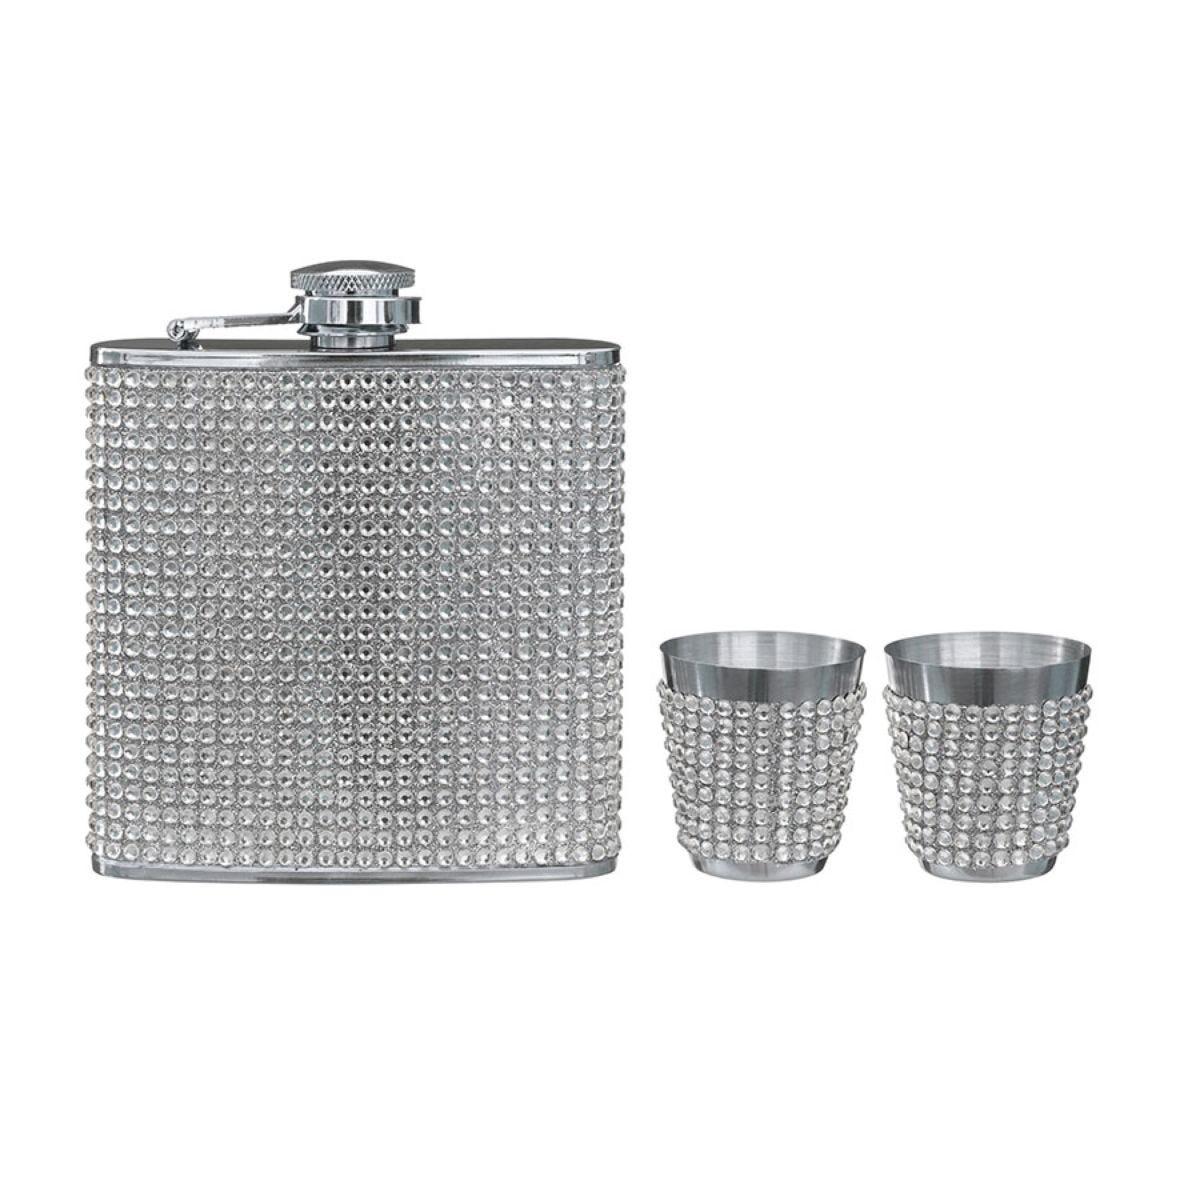 Premier Housewares Hip Flask Set - Stainless Steel